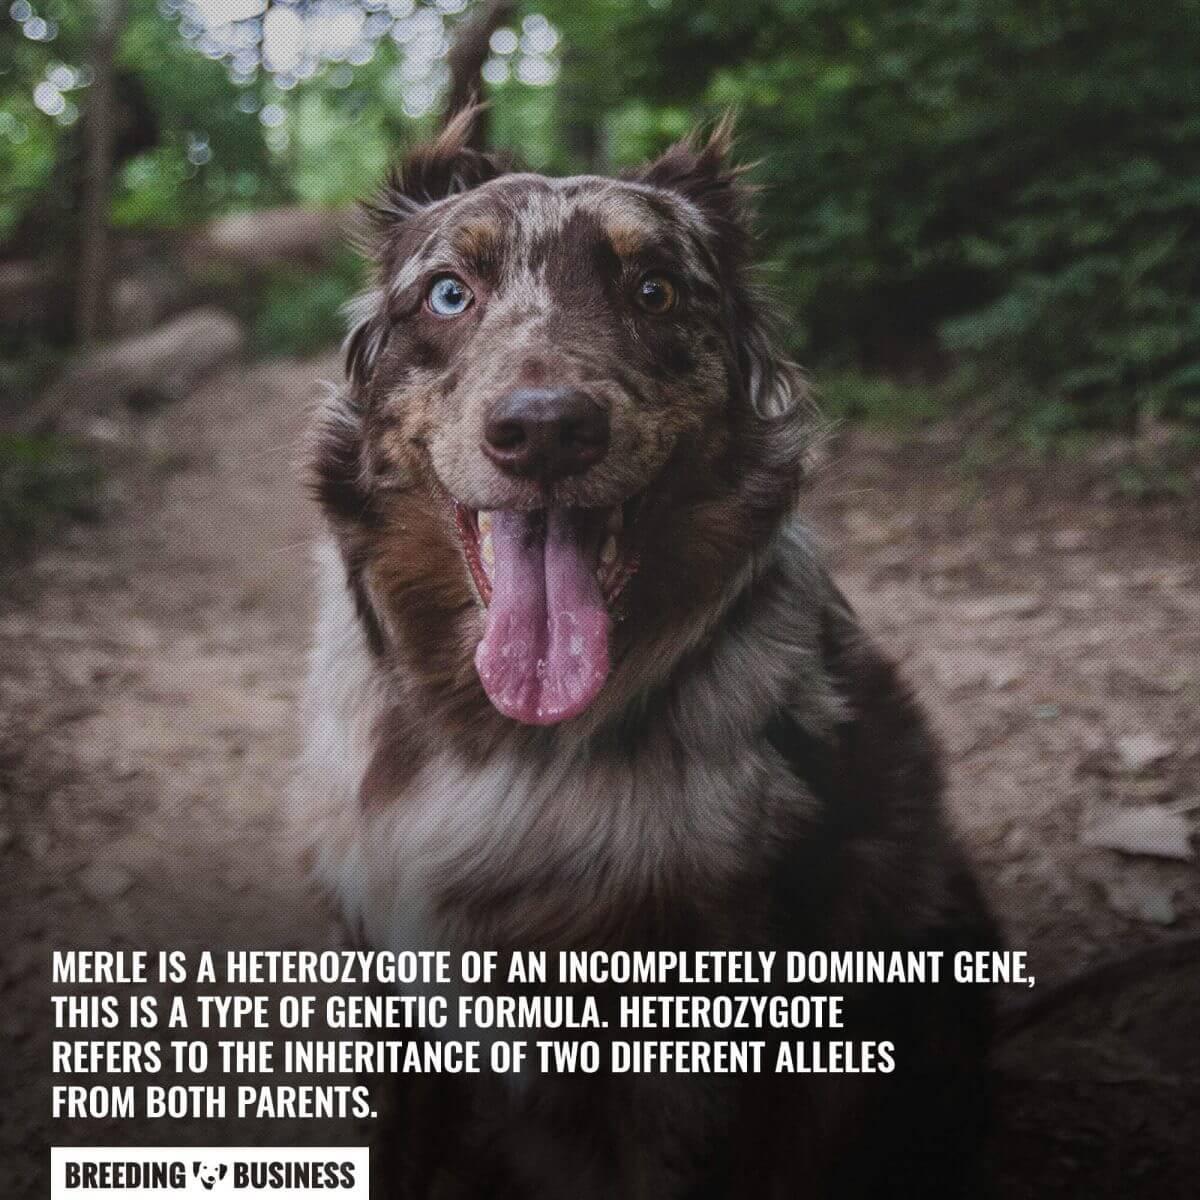 merle dog is a heterozygote trait (canine genetics)